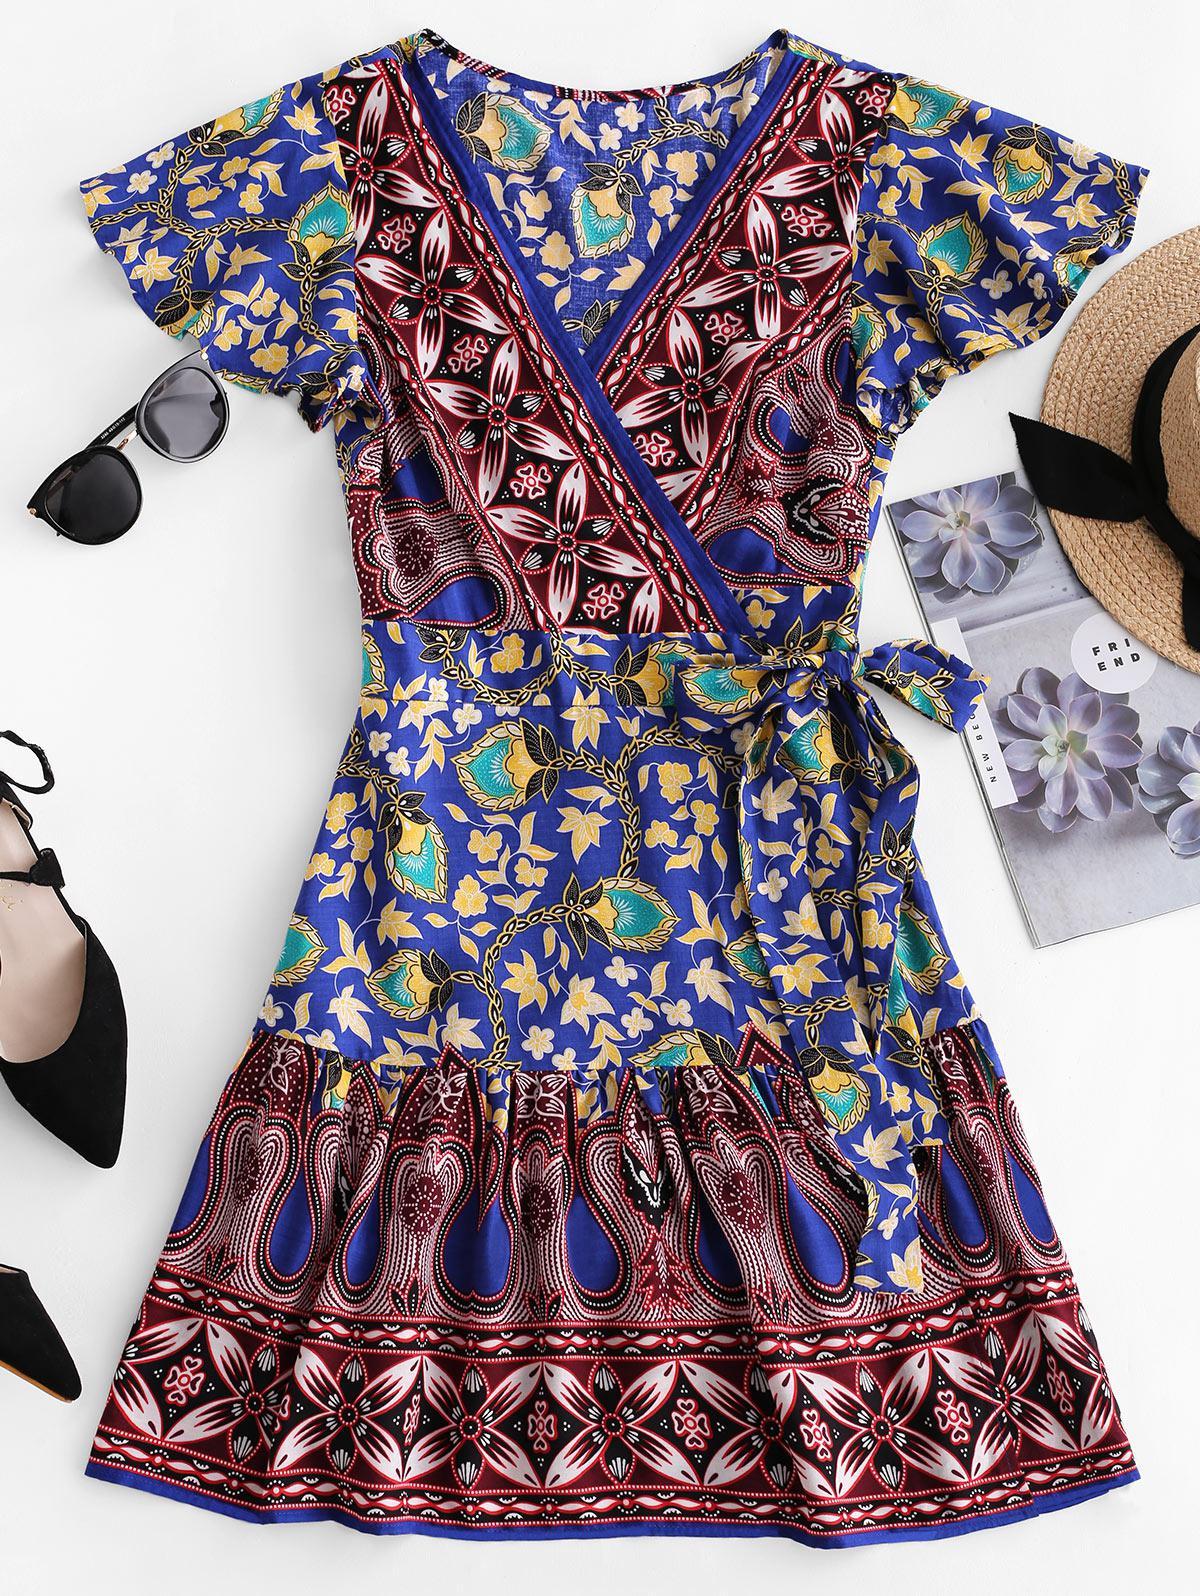 ZAFUL V Neck Floral Print Wrap Dress, Ocean blue